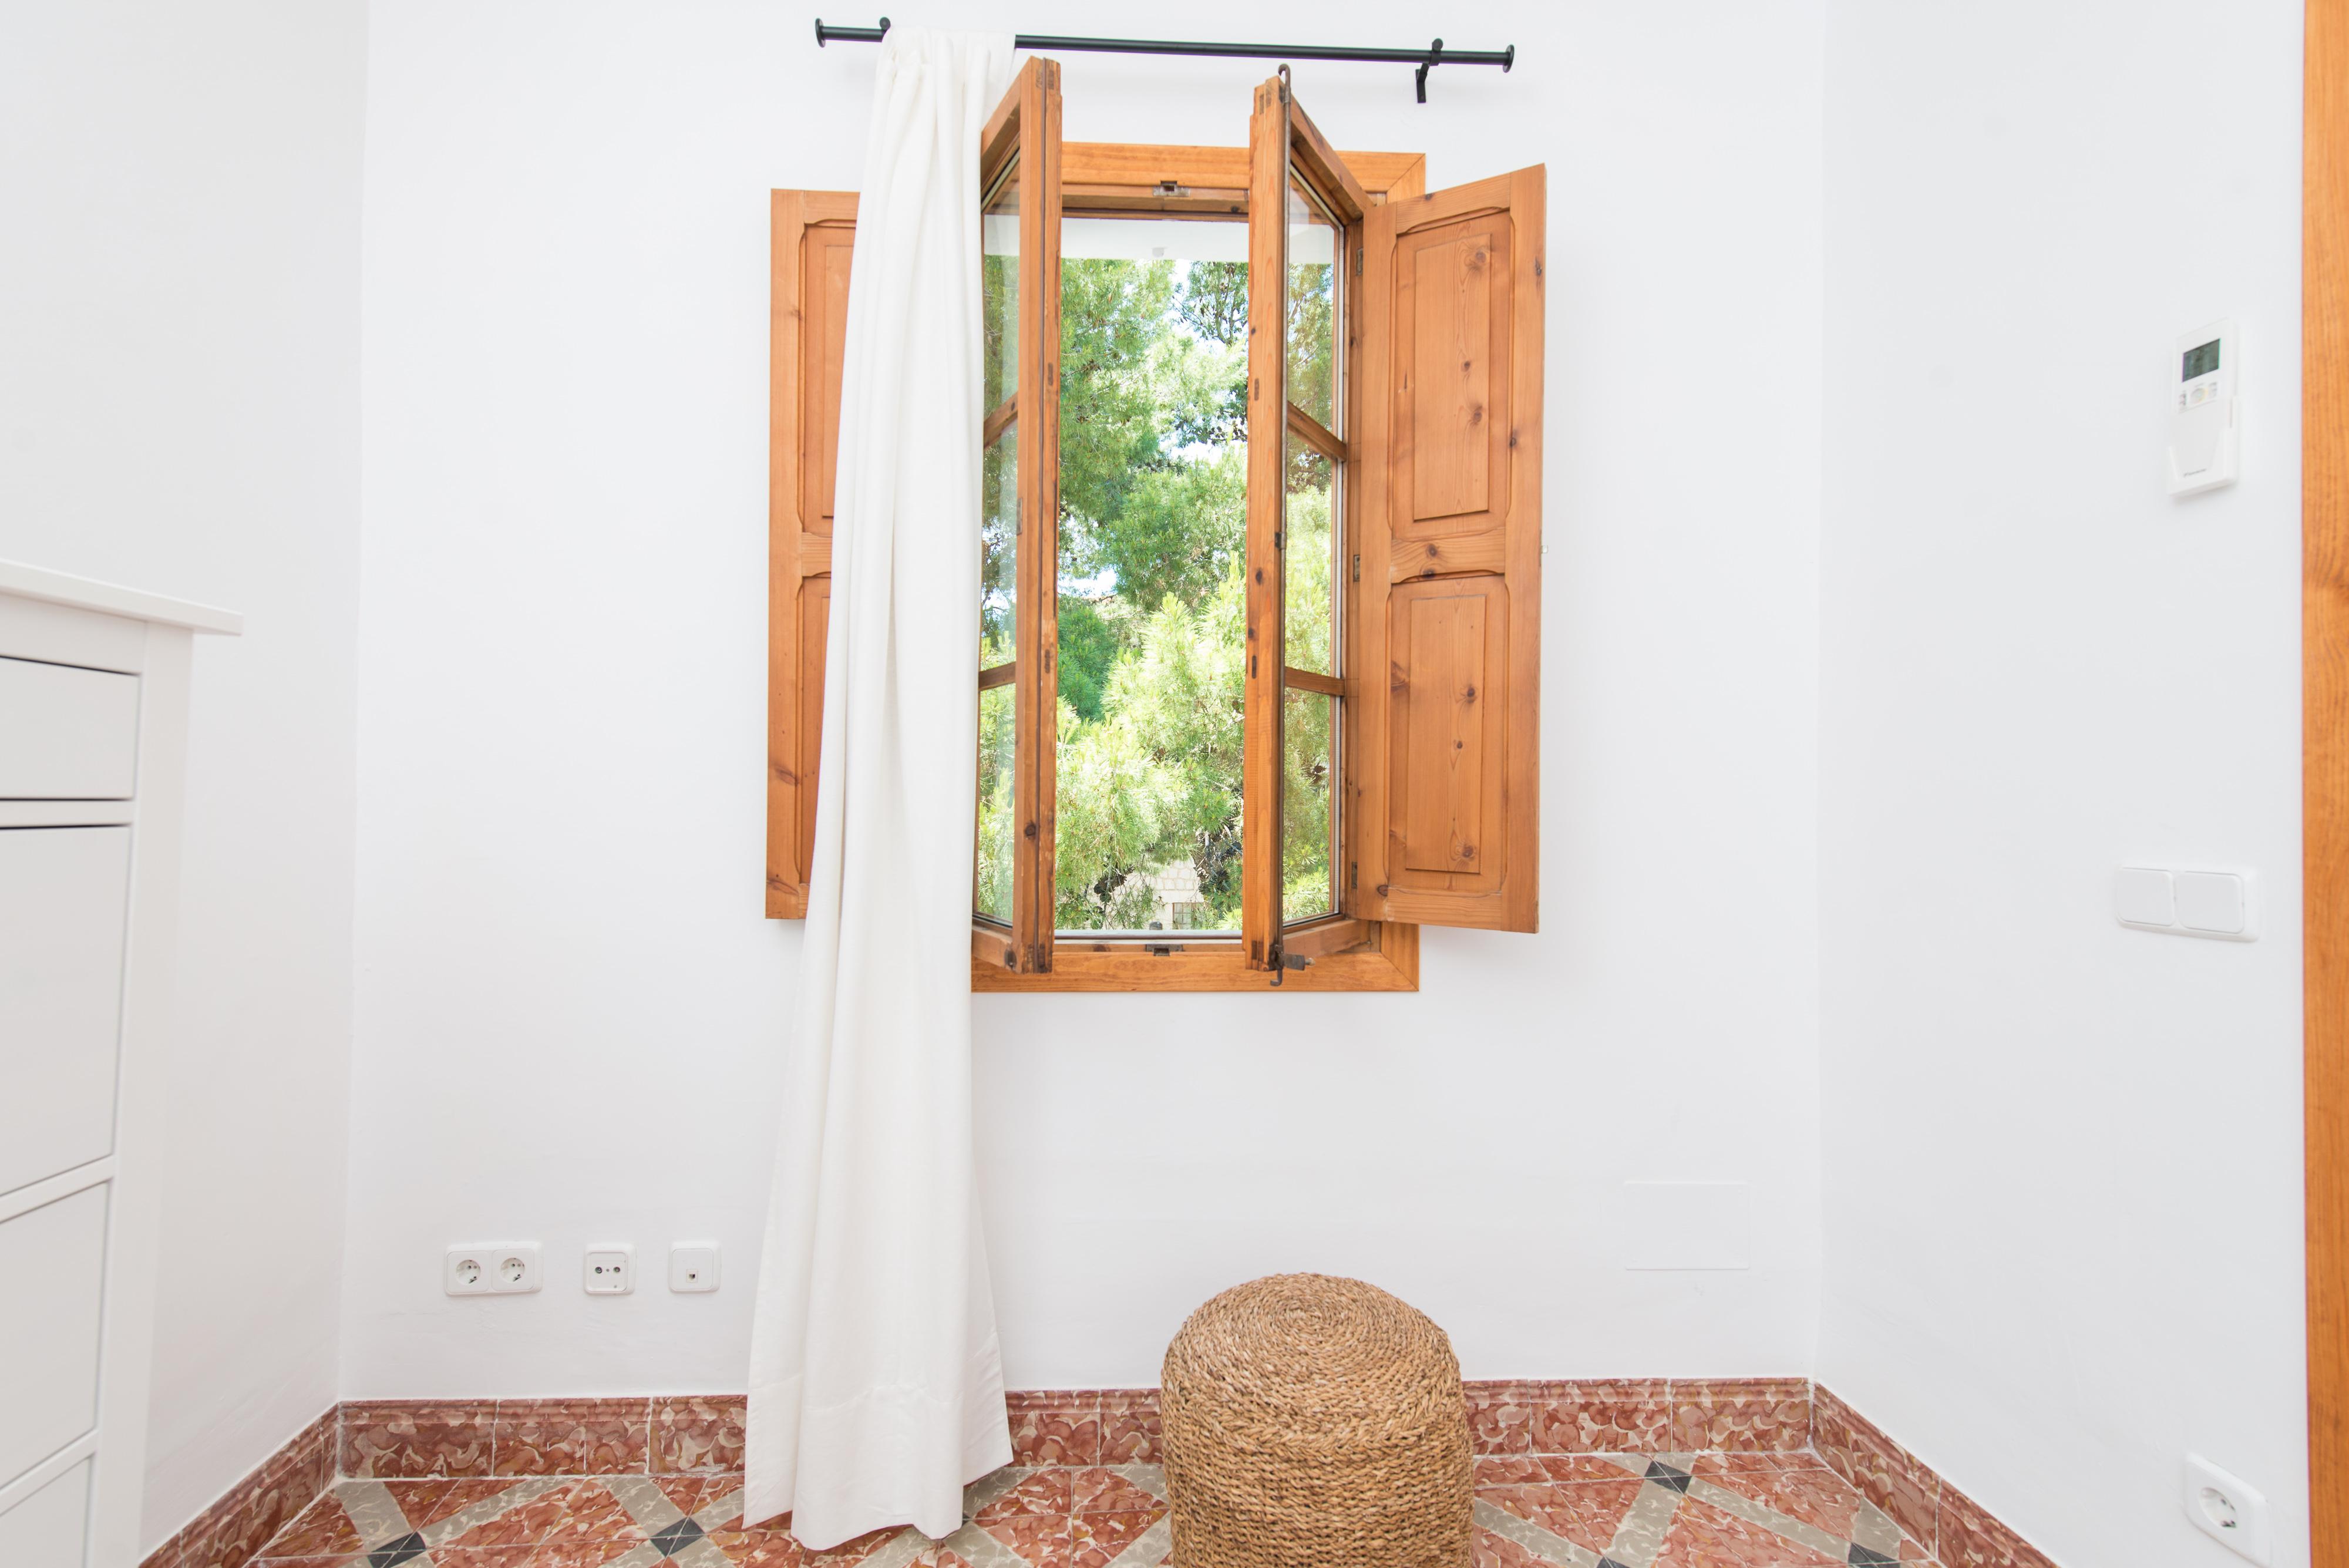 Maison de vacances CA NA MANDOLA (1956247), Alaro, Majorque, Iles Baléares, Espagne, image 23